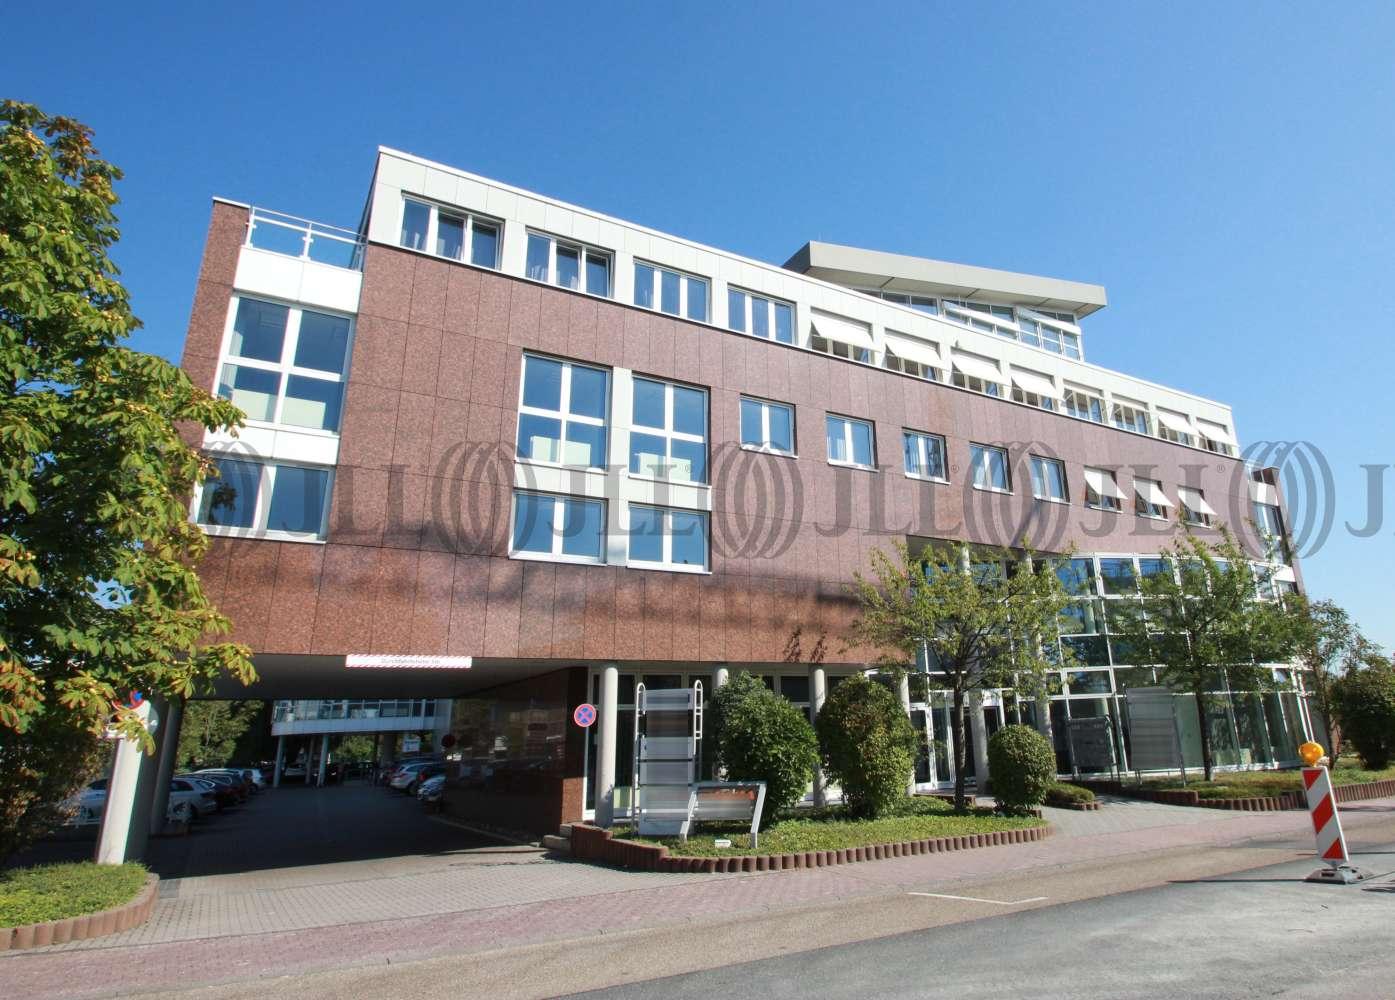 Büros Bad homburg vor der höhe, 61348 - Büro - Bad Homburg vor der Höhe - F0841 - 9578317